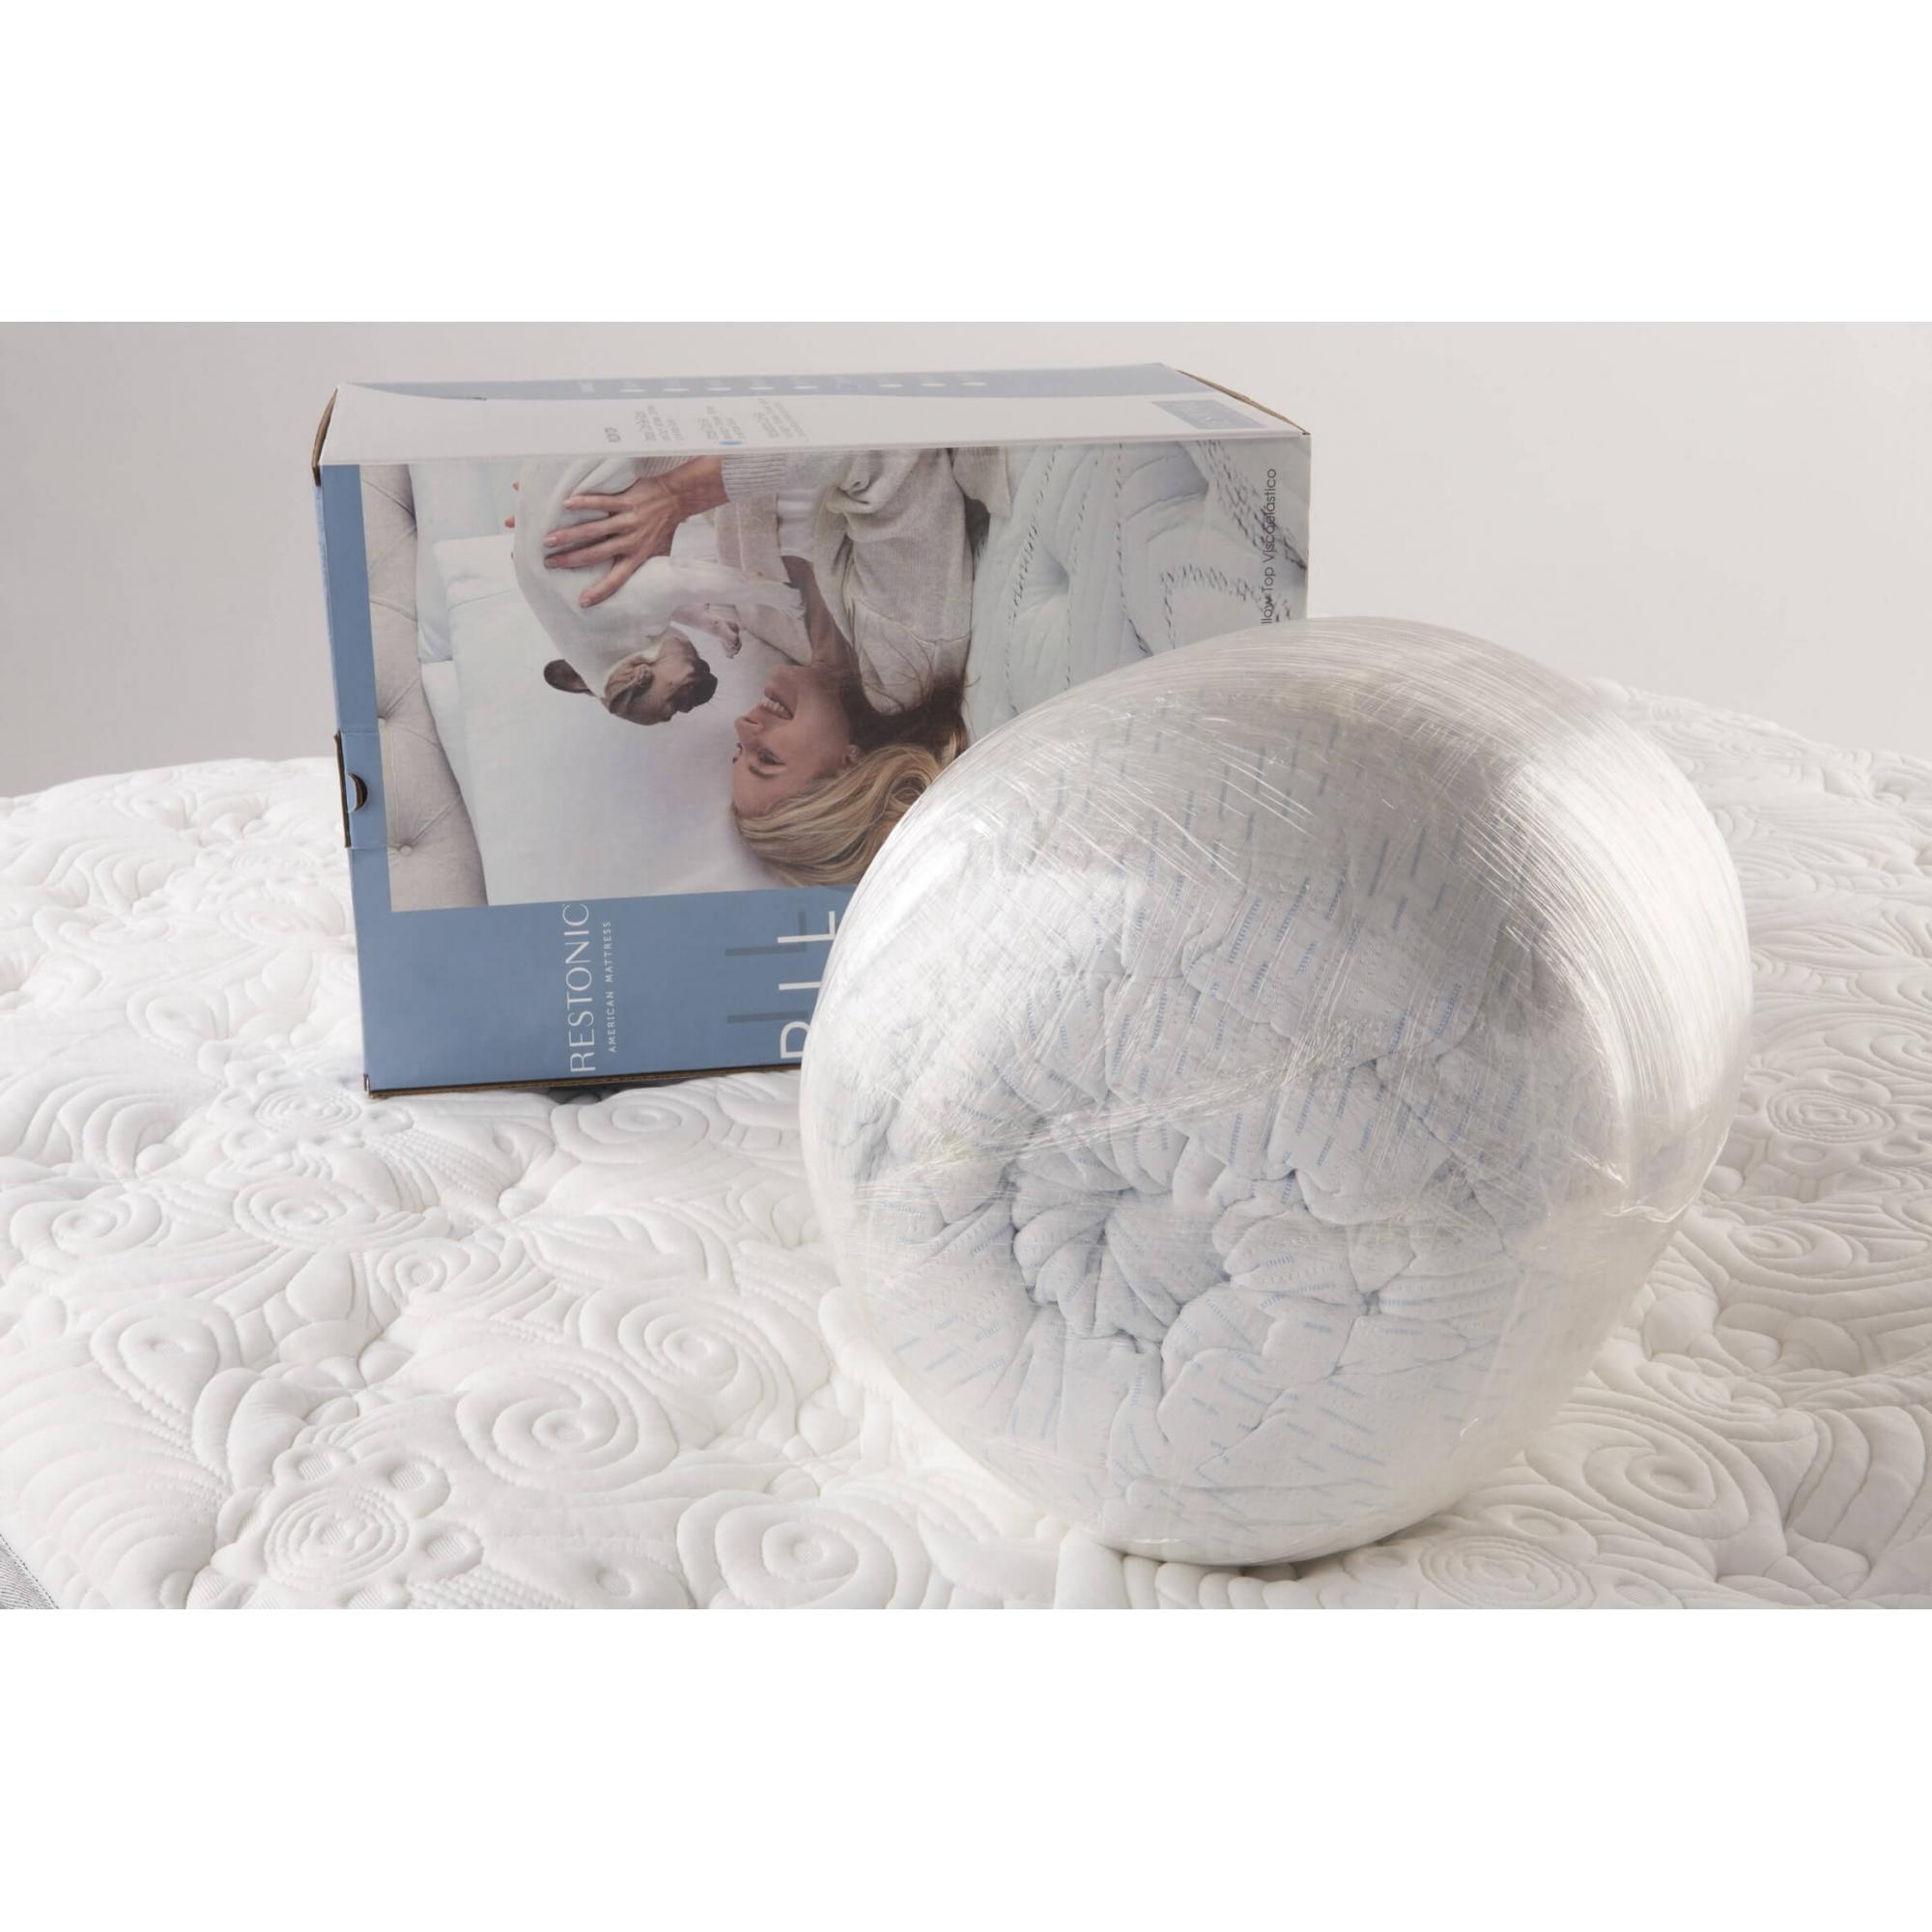 Pillow Top Restonic Visco Coolgelpad Casal 1,38x1,88x4 cm